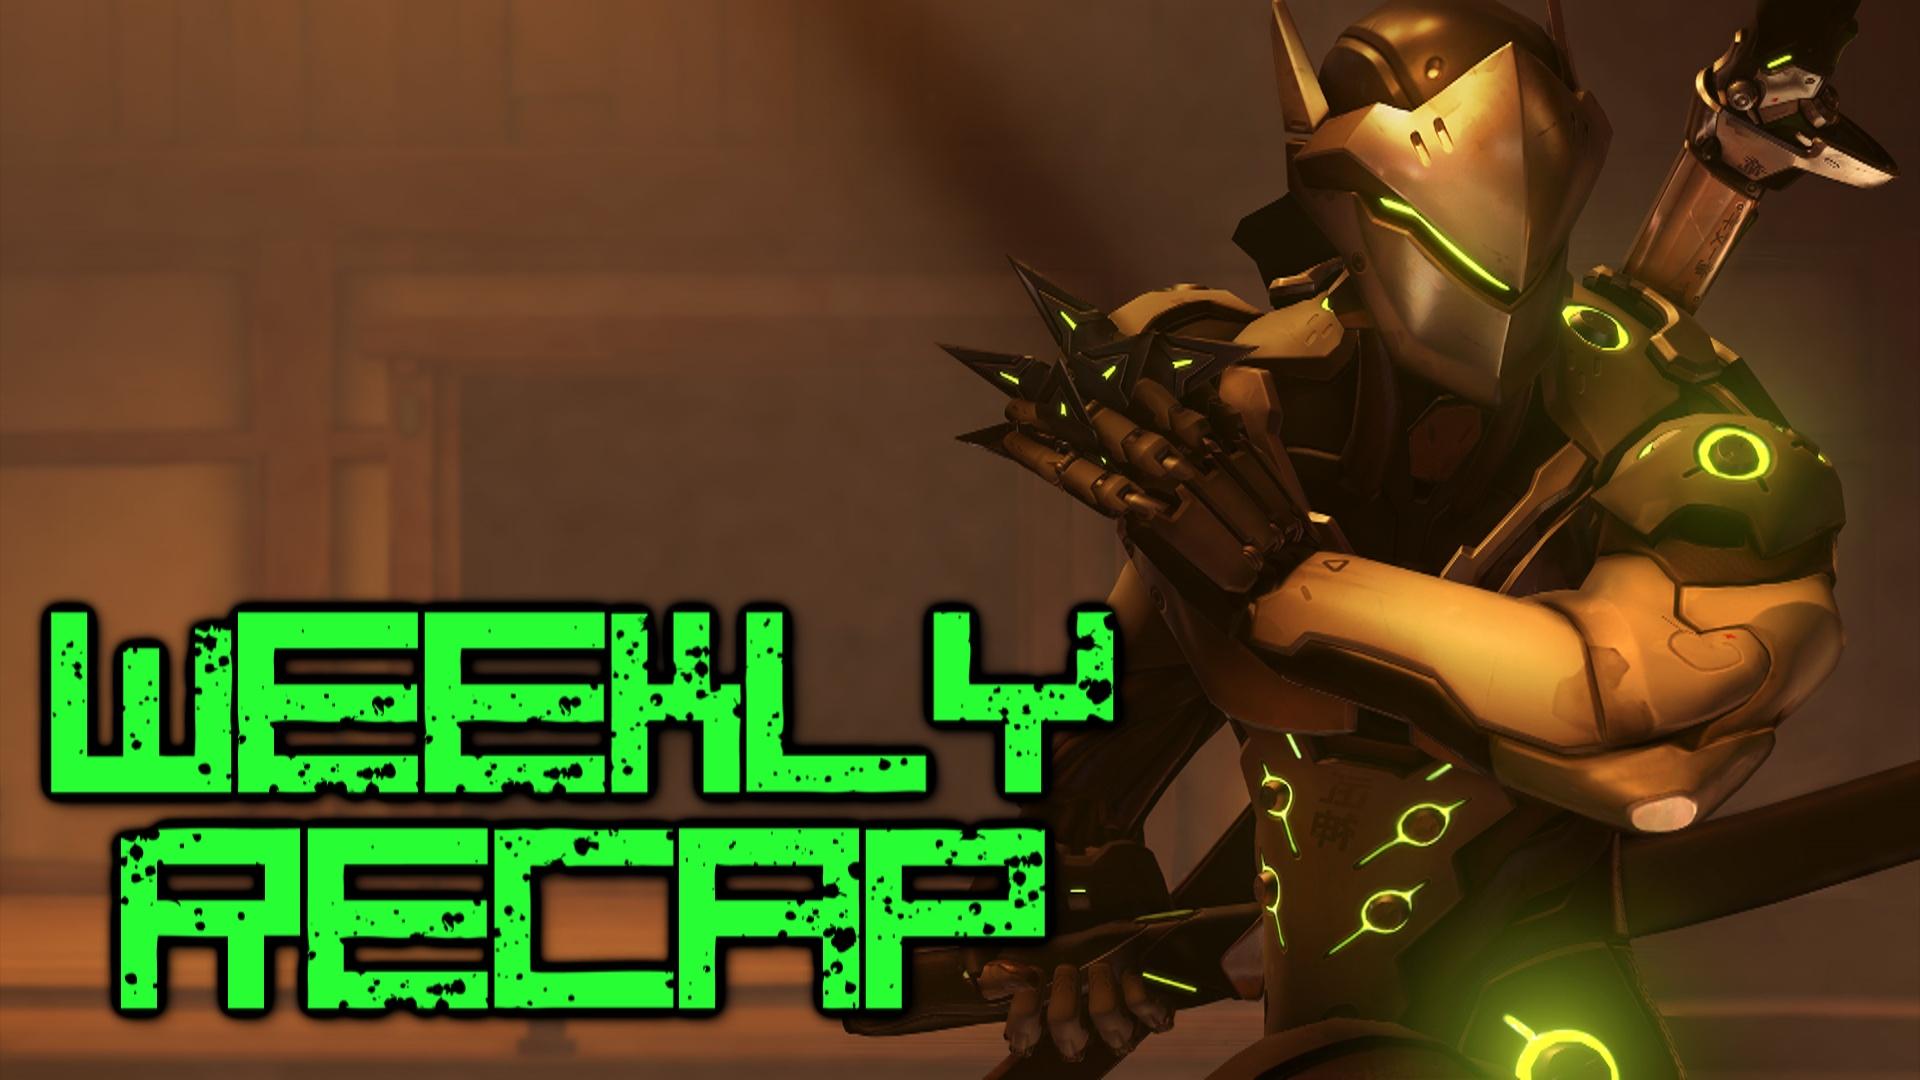 MMOHuts Weekly Recap #264 Nov. 9th - Blizzcon, Krosmaster, Tera & More!